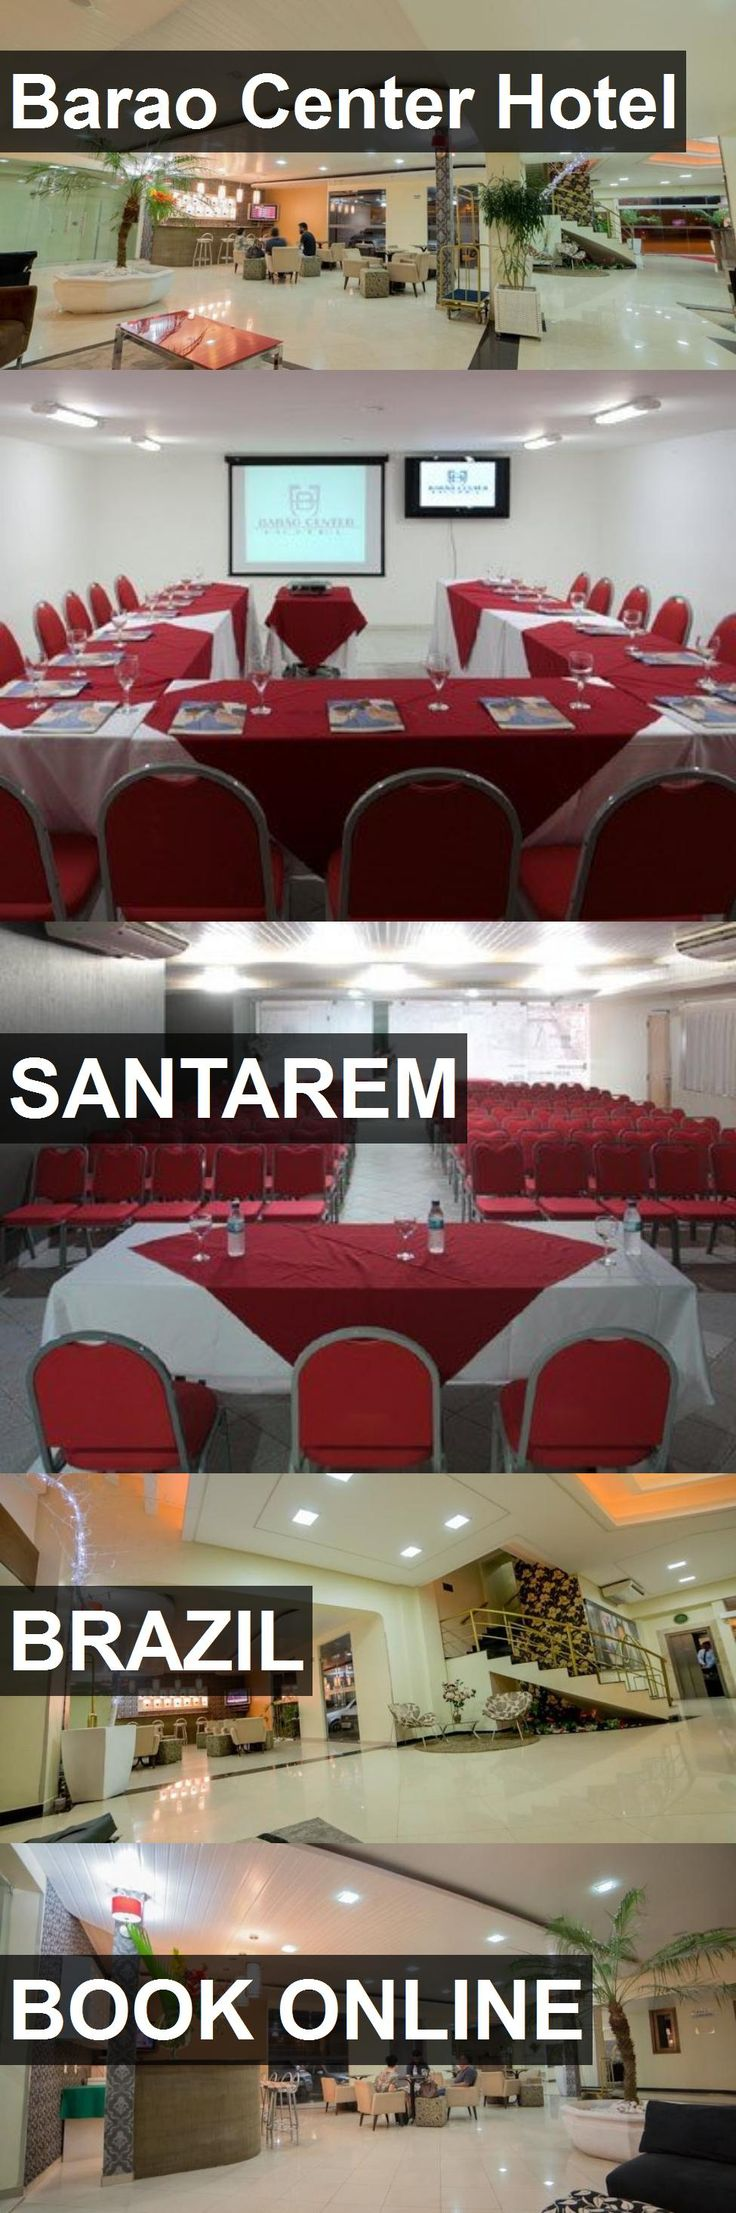 Hotel Barao Center Hotel in Santarem, Brazil. For more information, photos, reviews and best prices please follow the link. #Brazil #Santarem #BaraoCenterHotel #hotel #travel #vacation